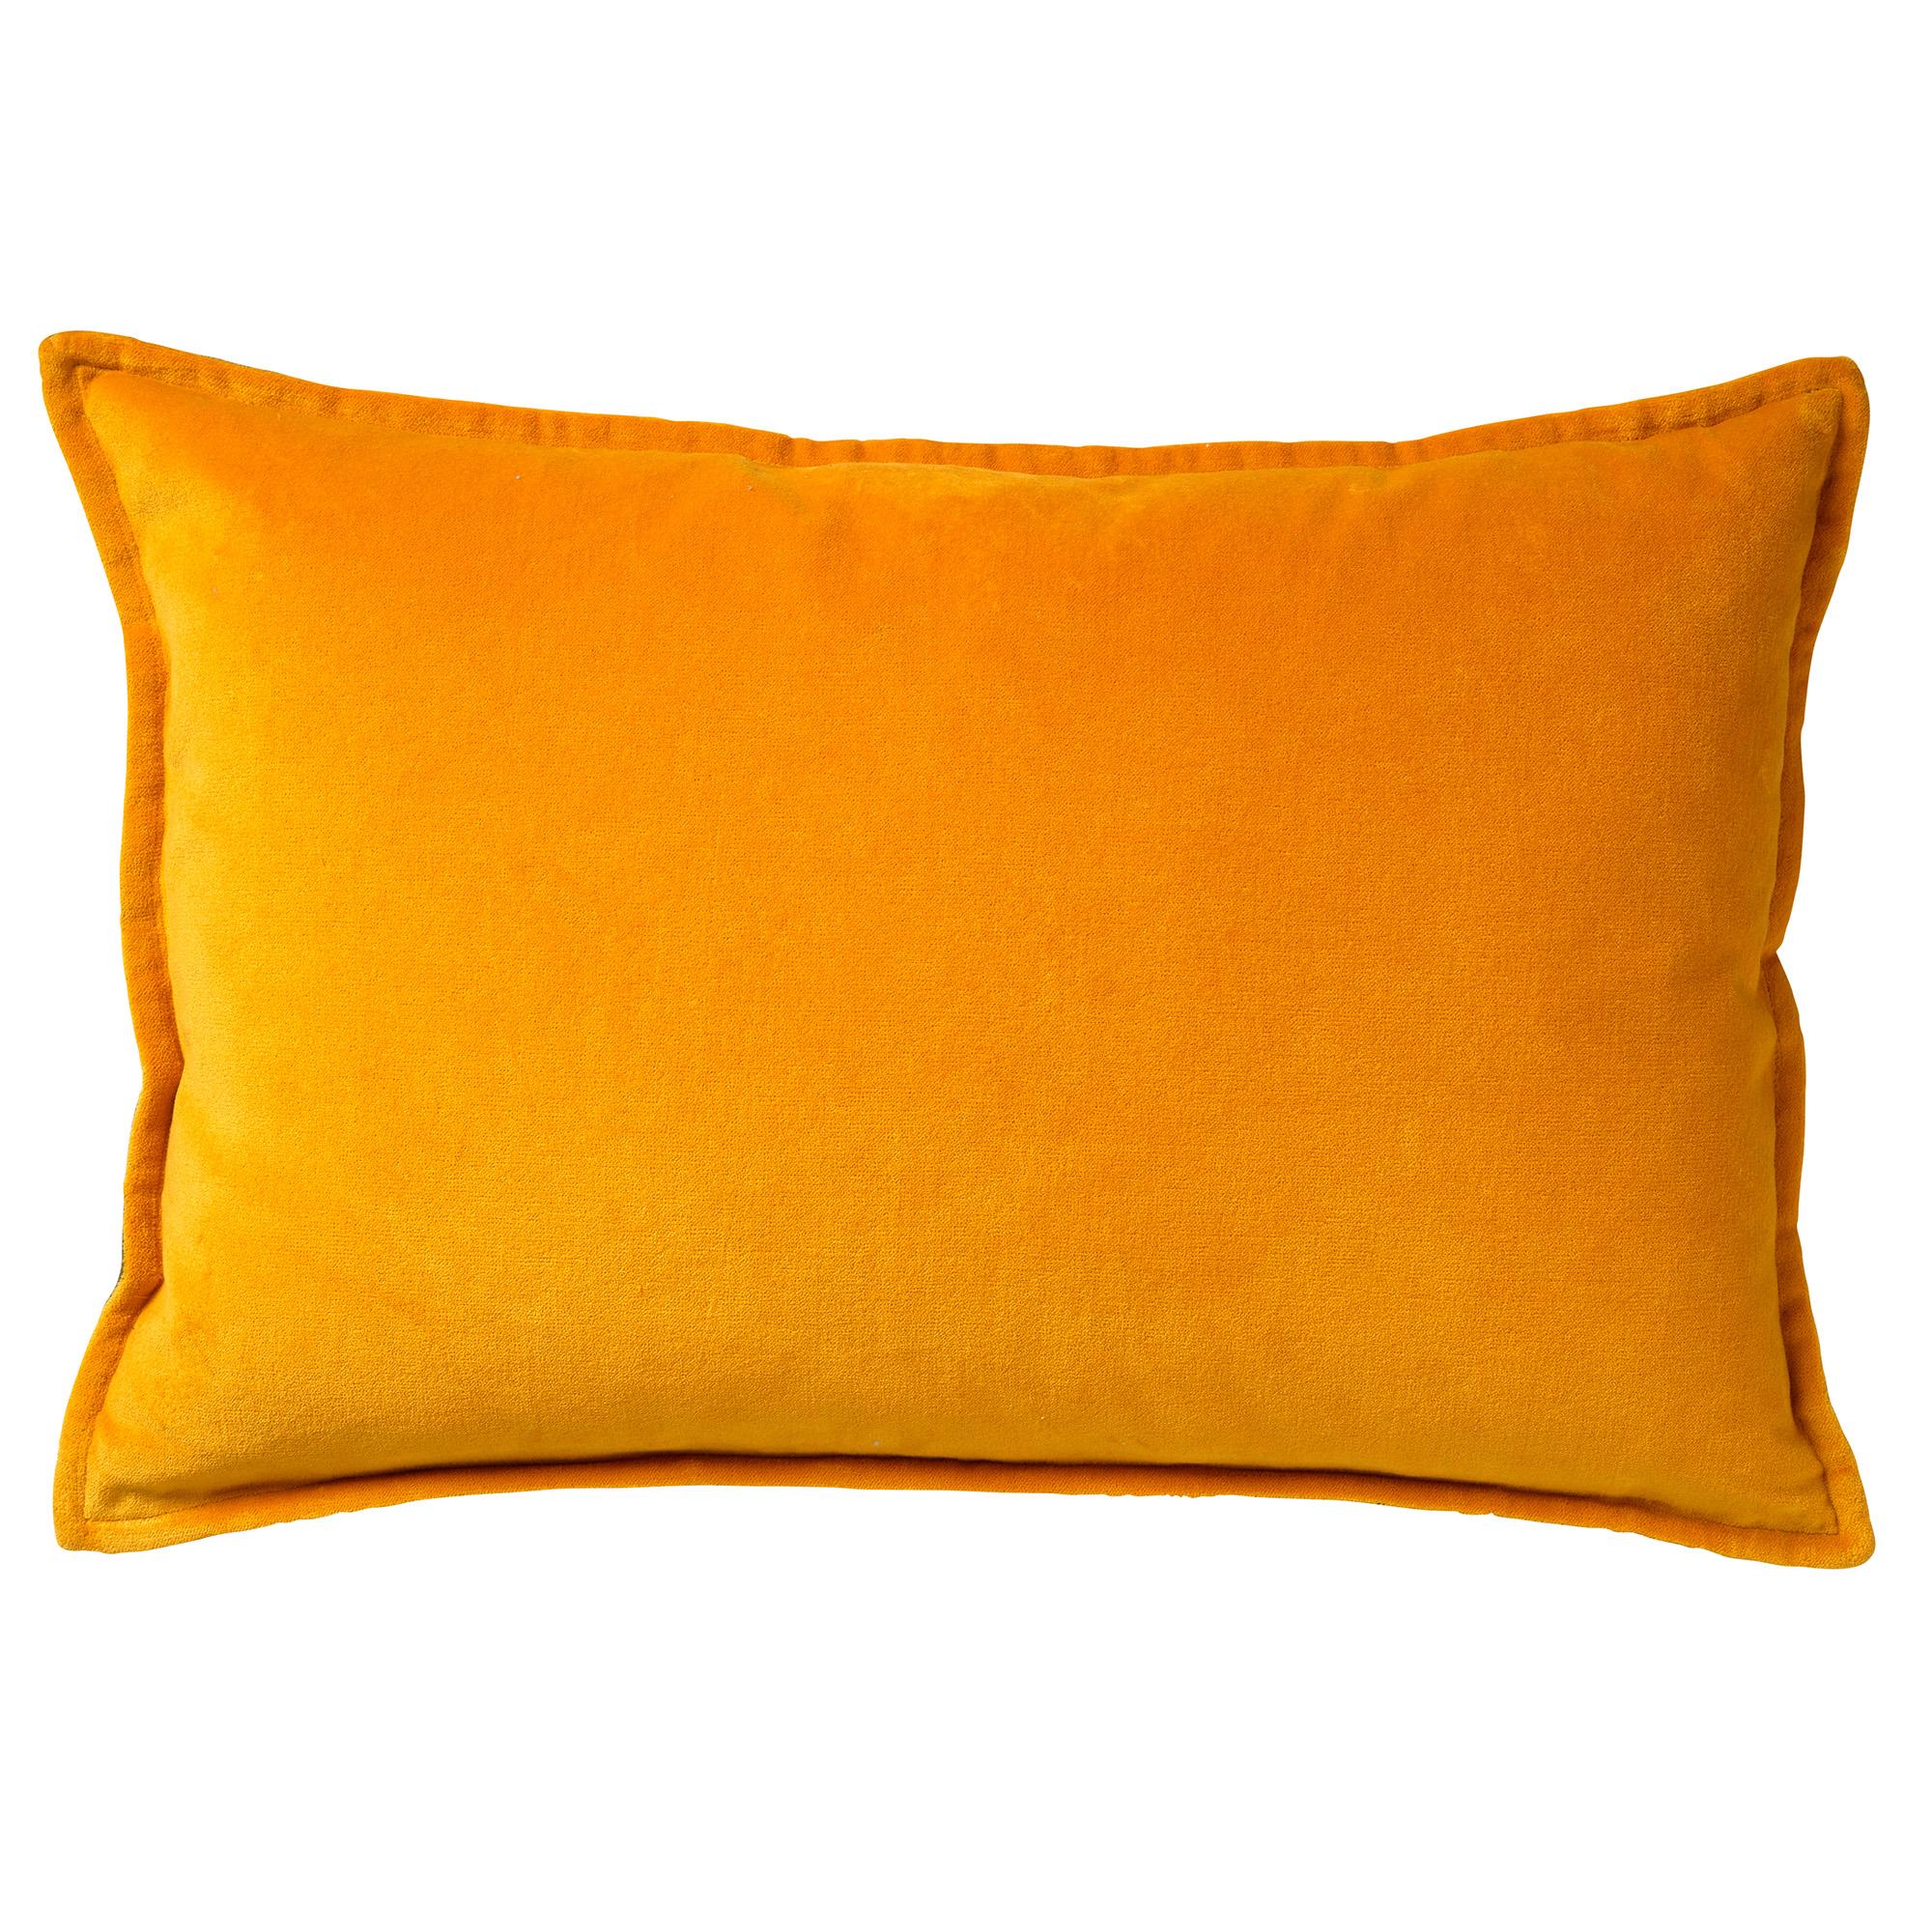 FAY - Sierkussen velvet Golden Glow 40x60 cm